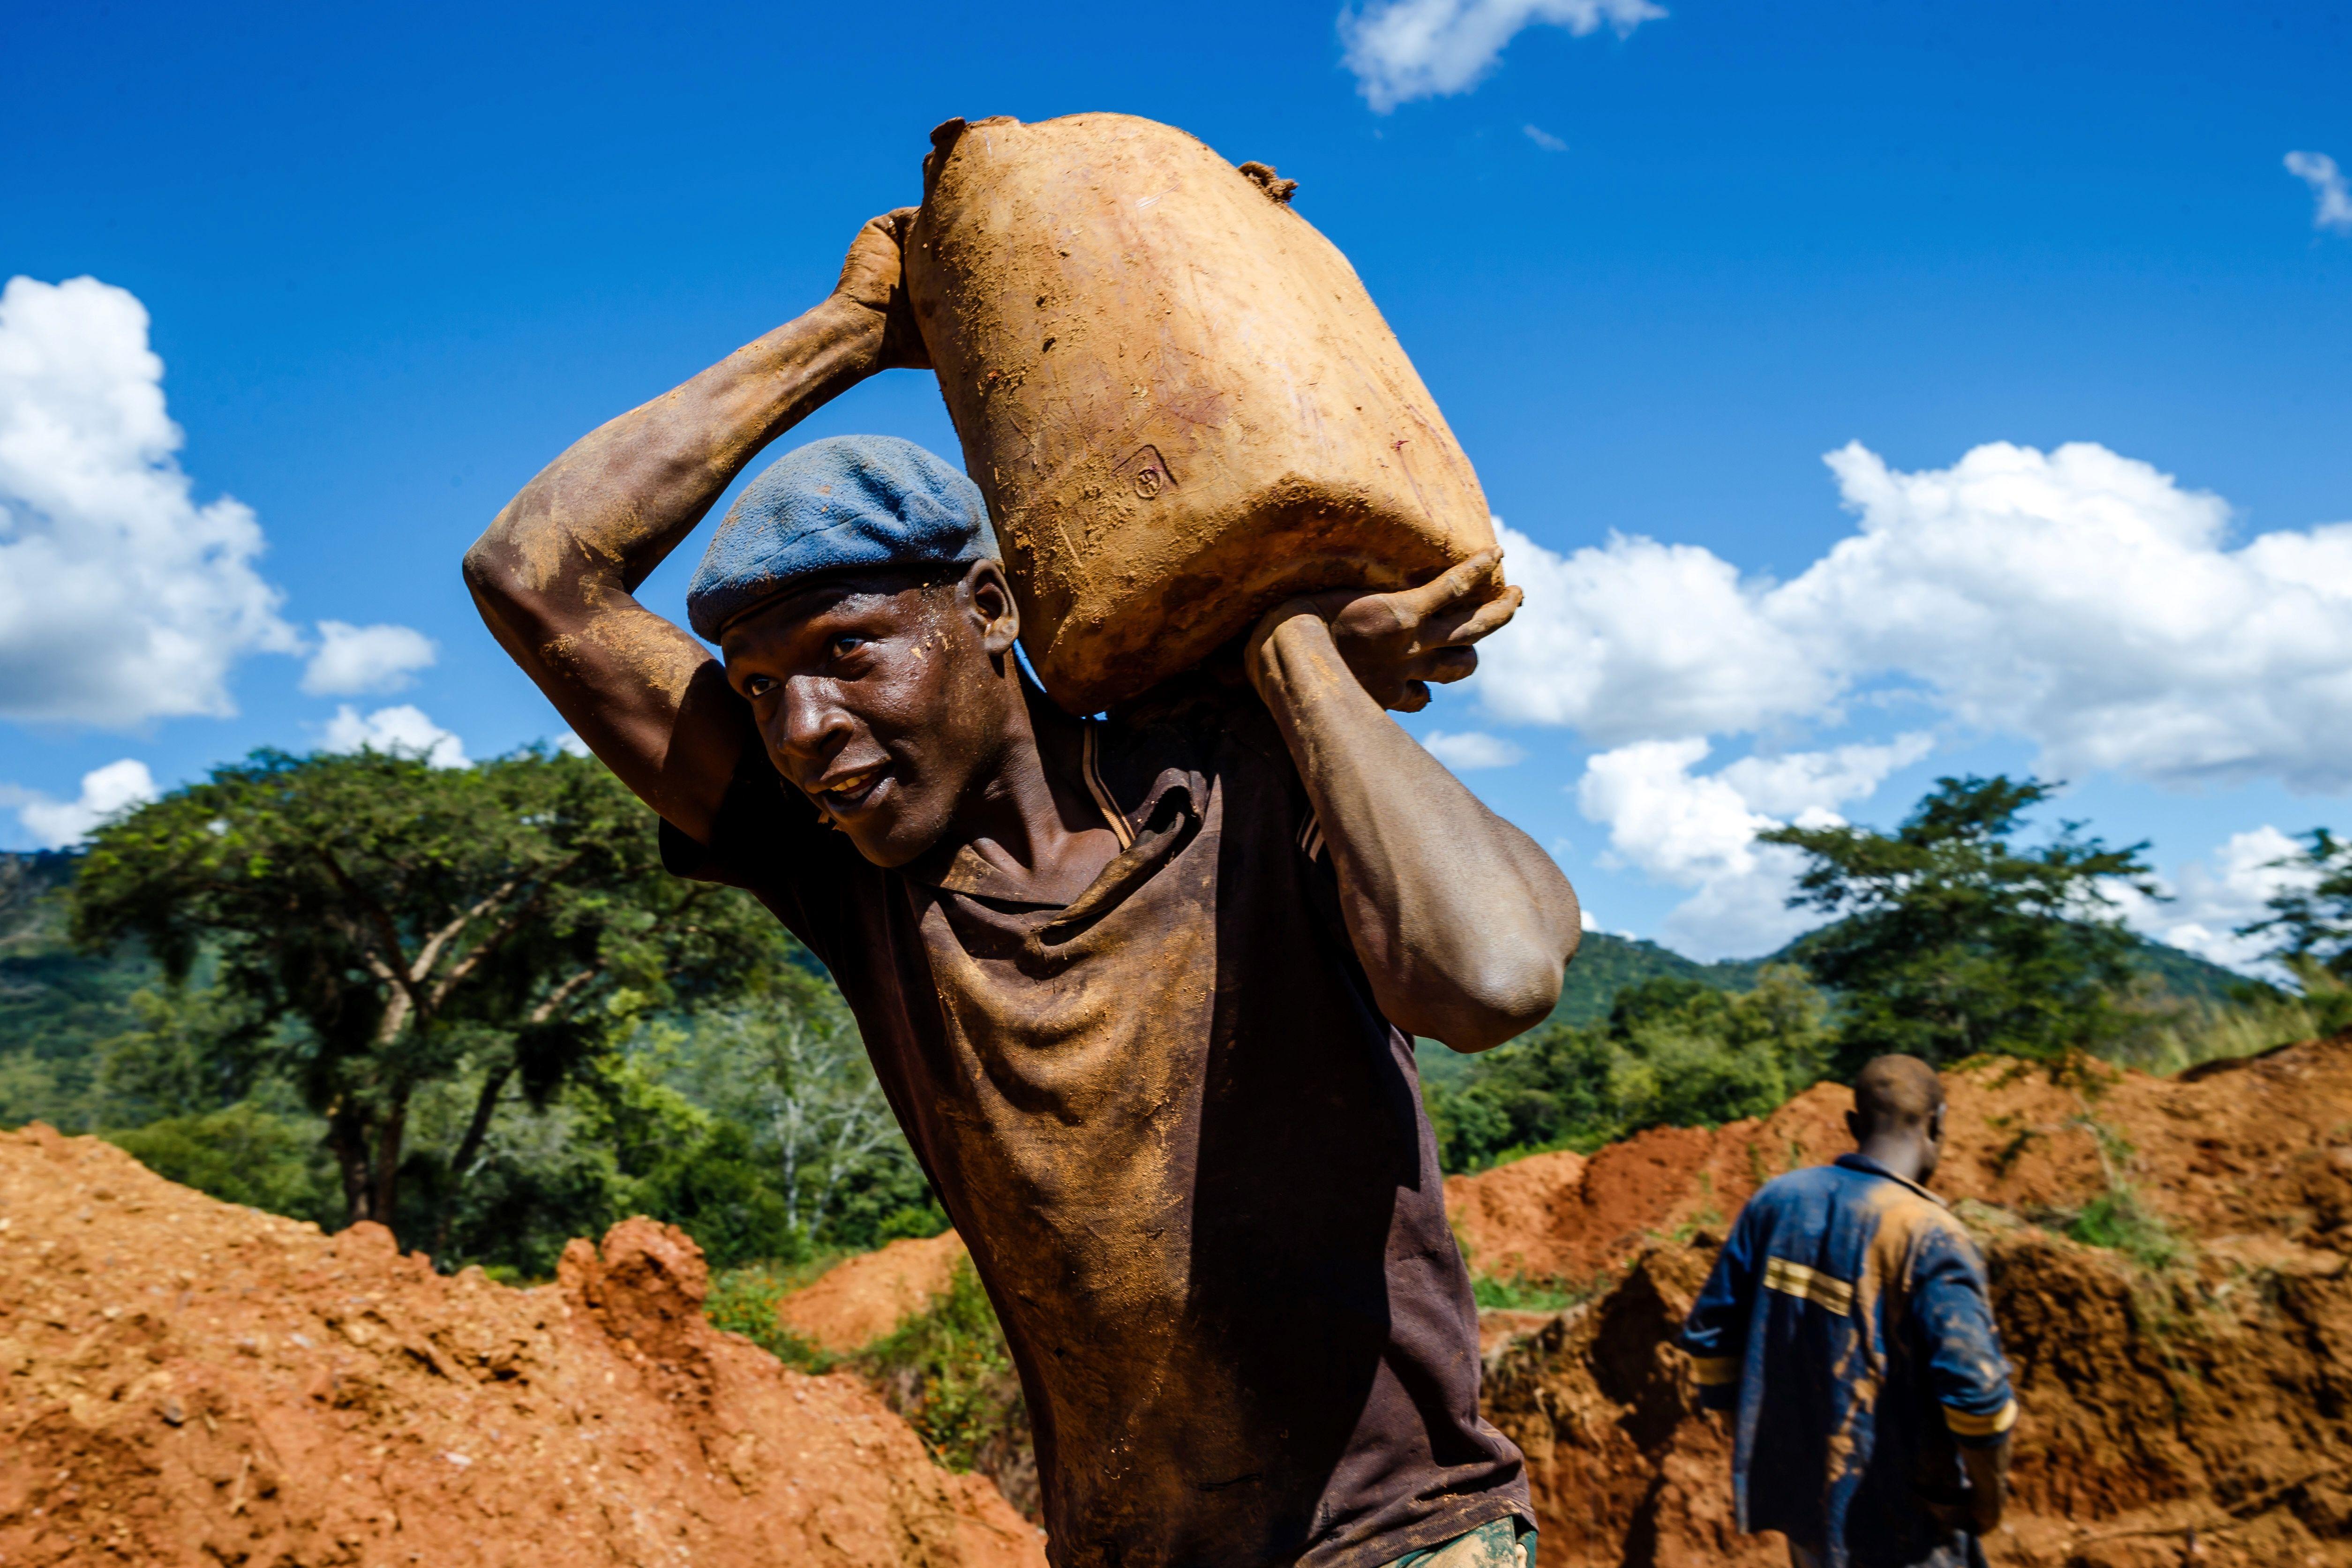 China Expands Influence Over Zimbabwe Natural Resources